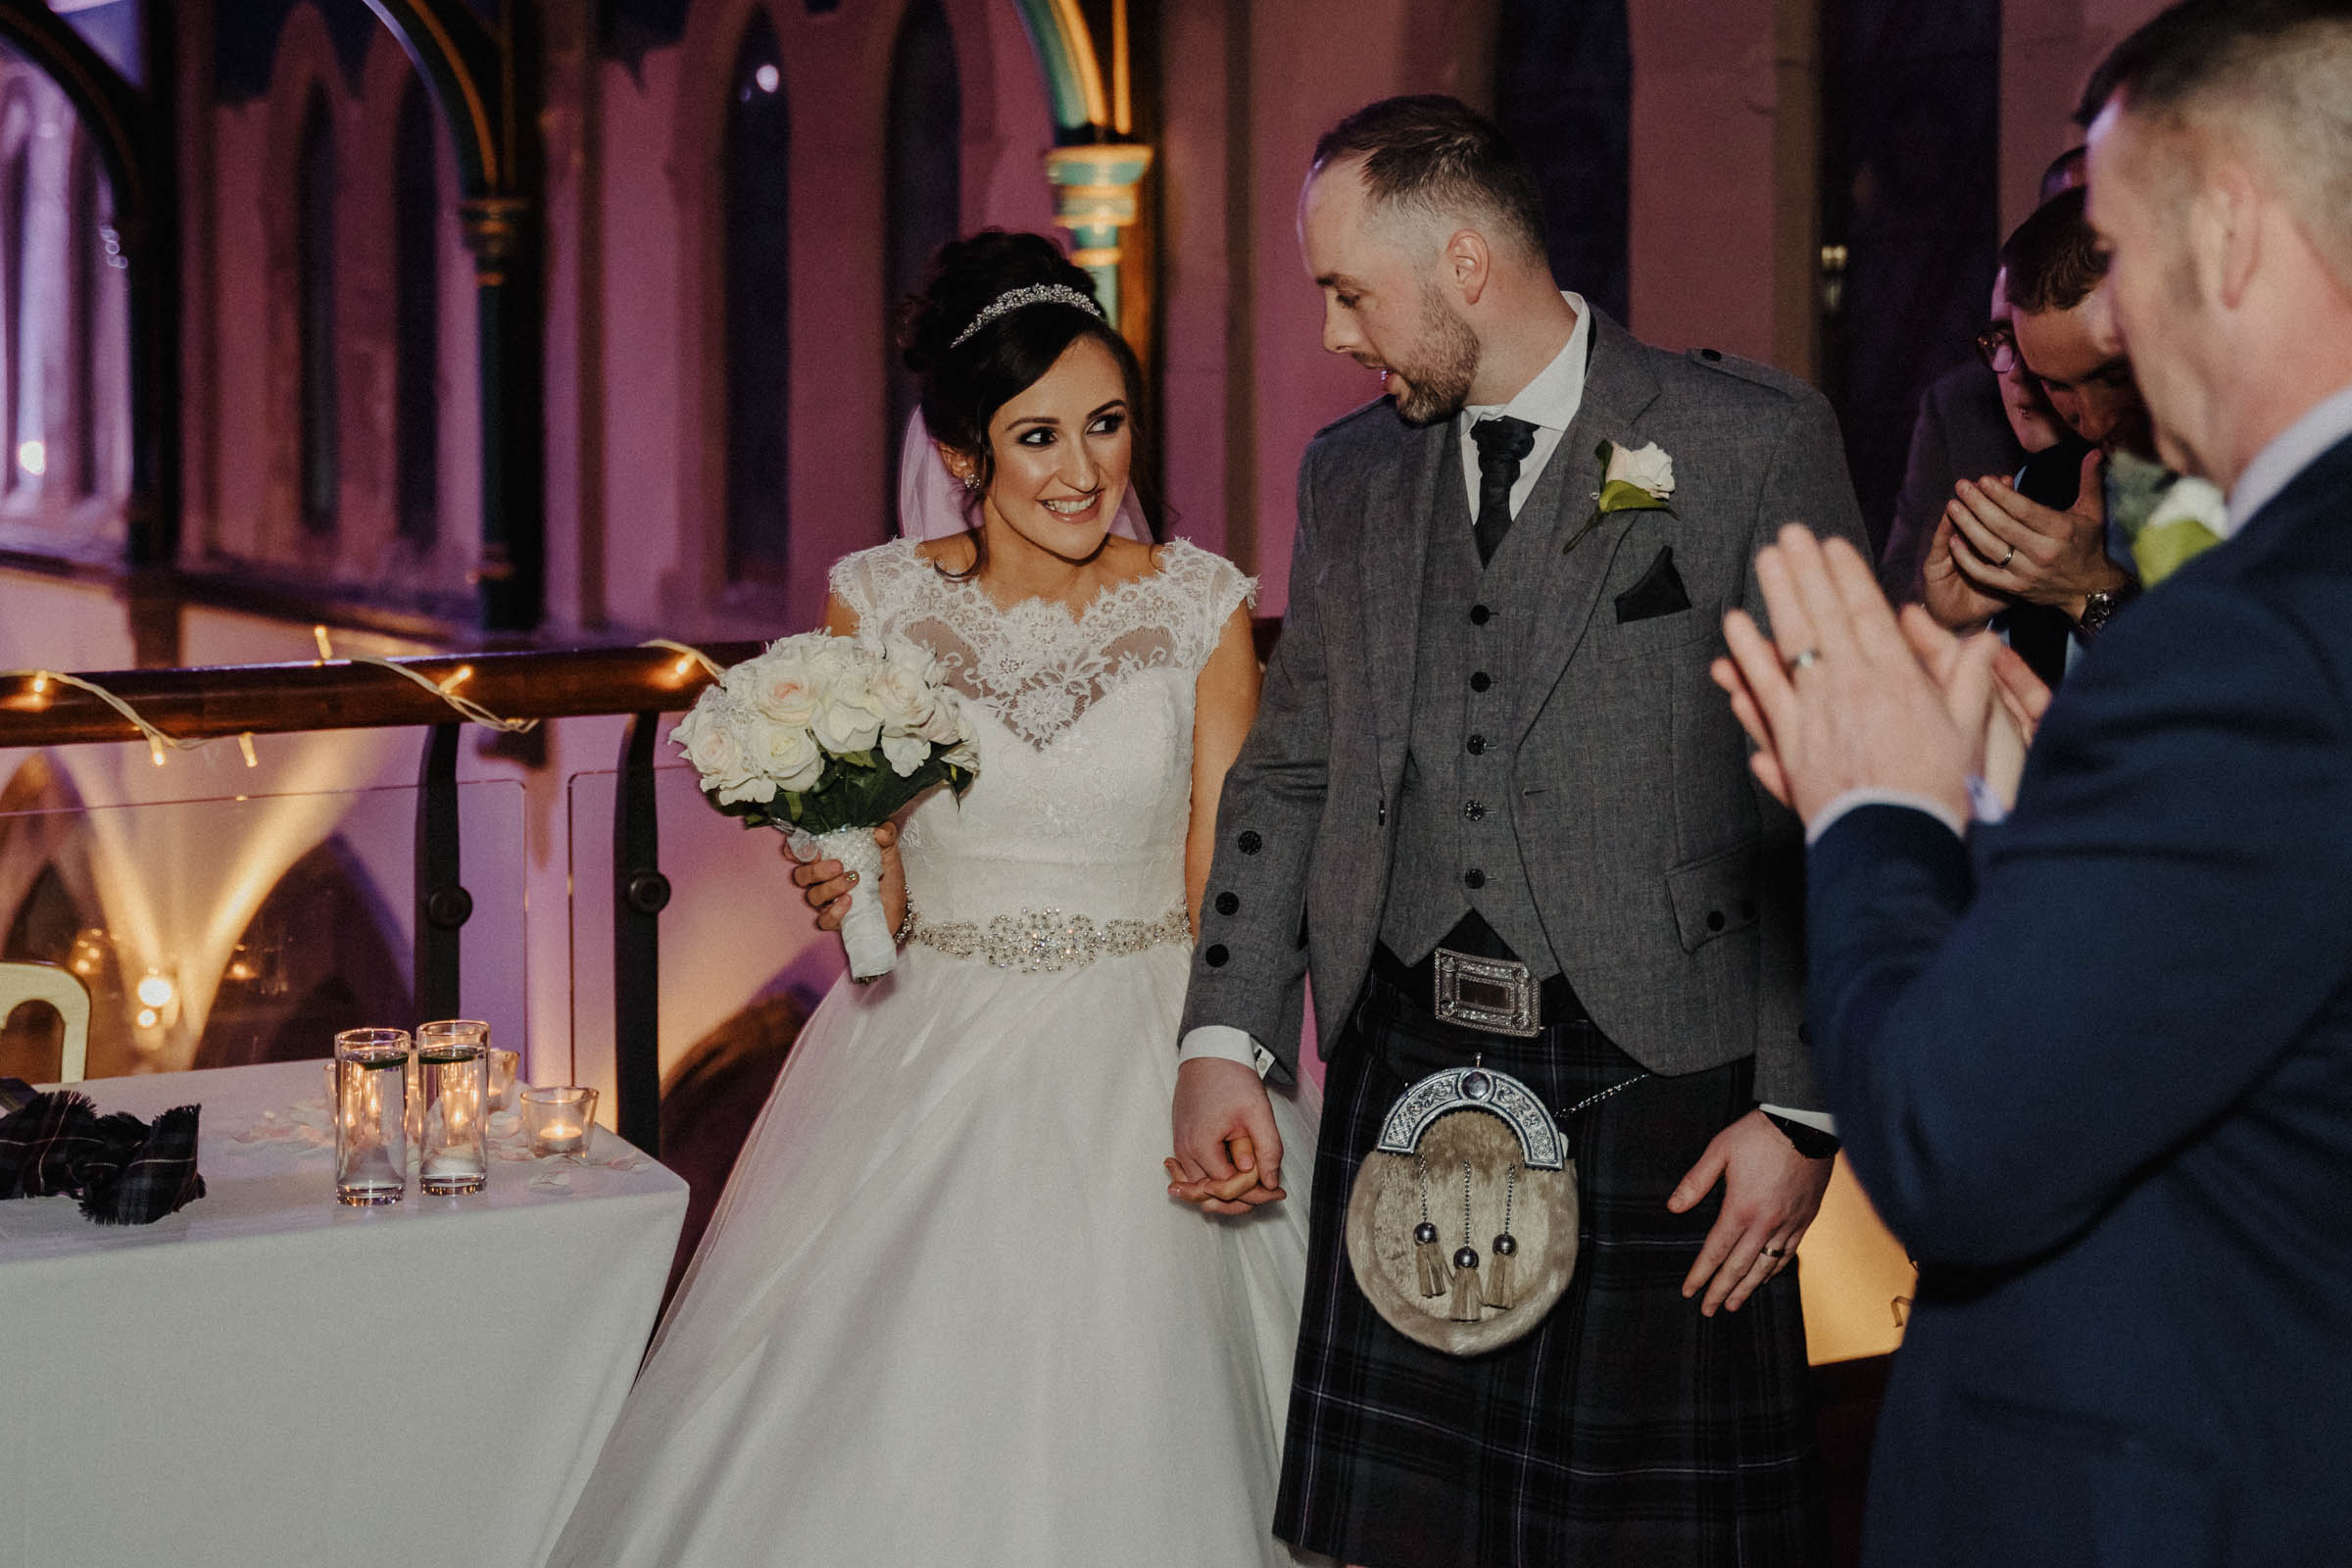 Oran-Mor-Wedding-Photographer-DearlyPhotography (23 of 55).jpg